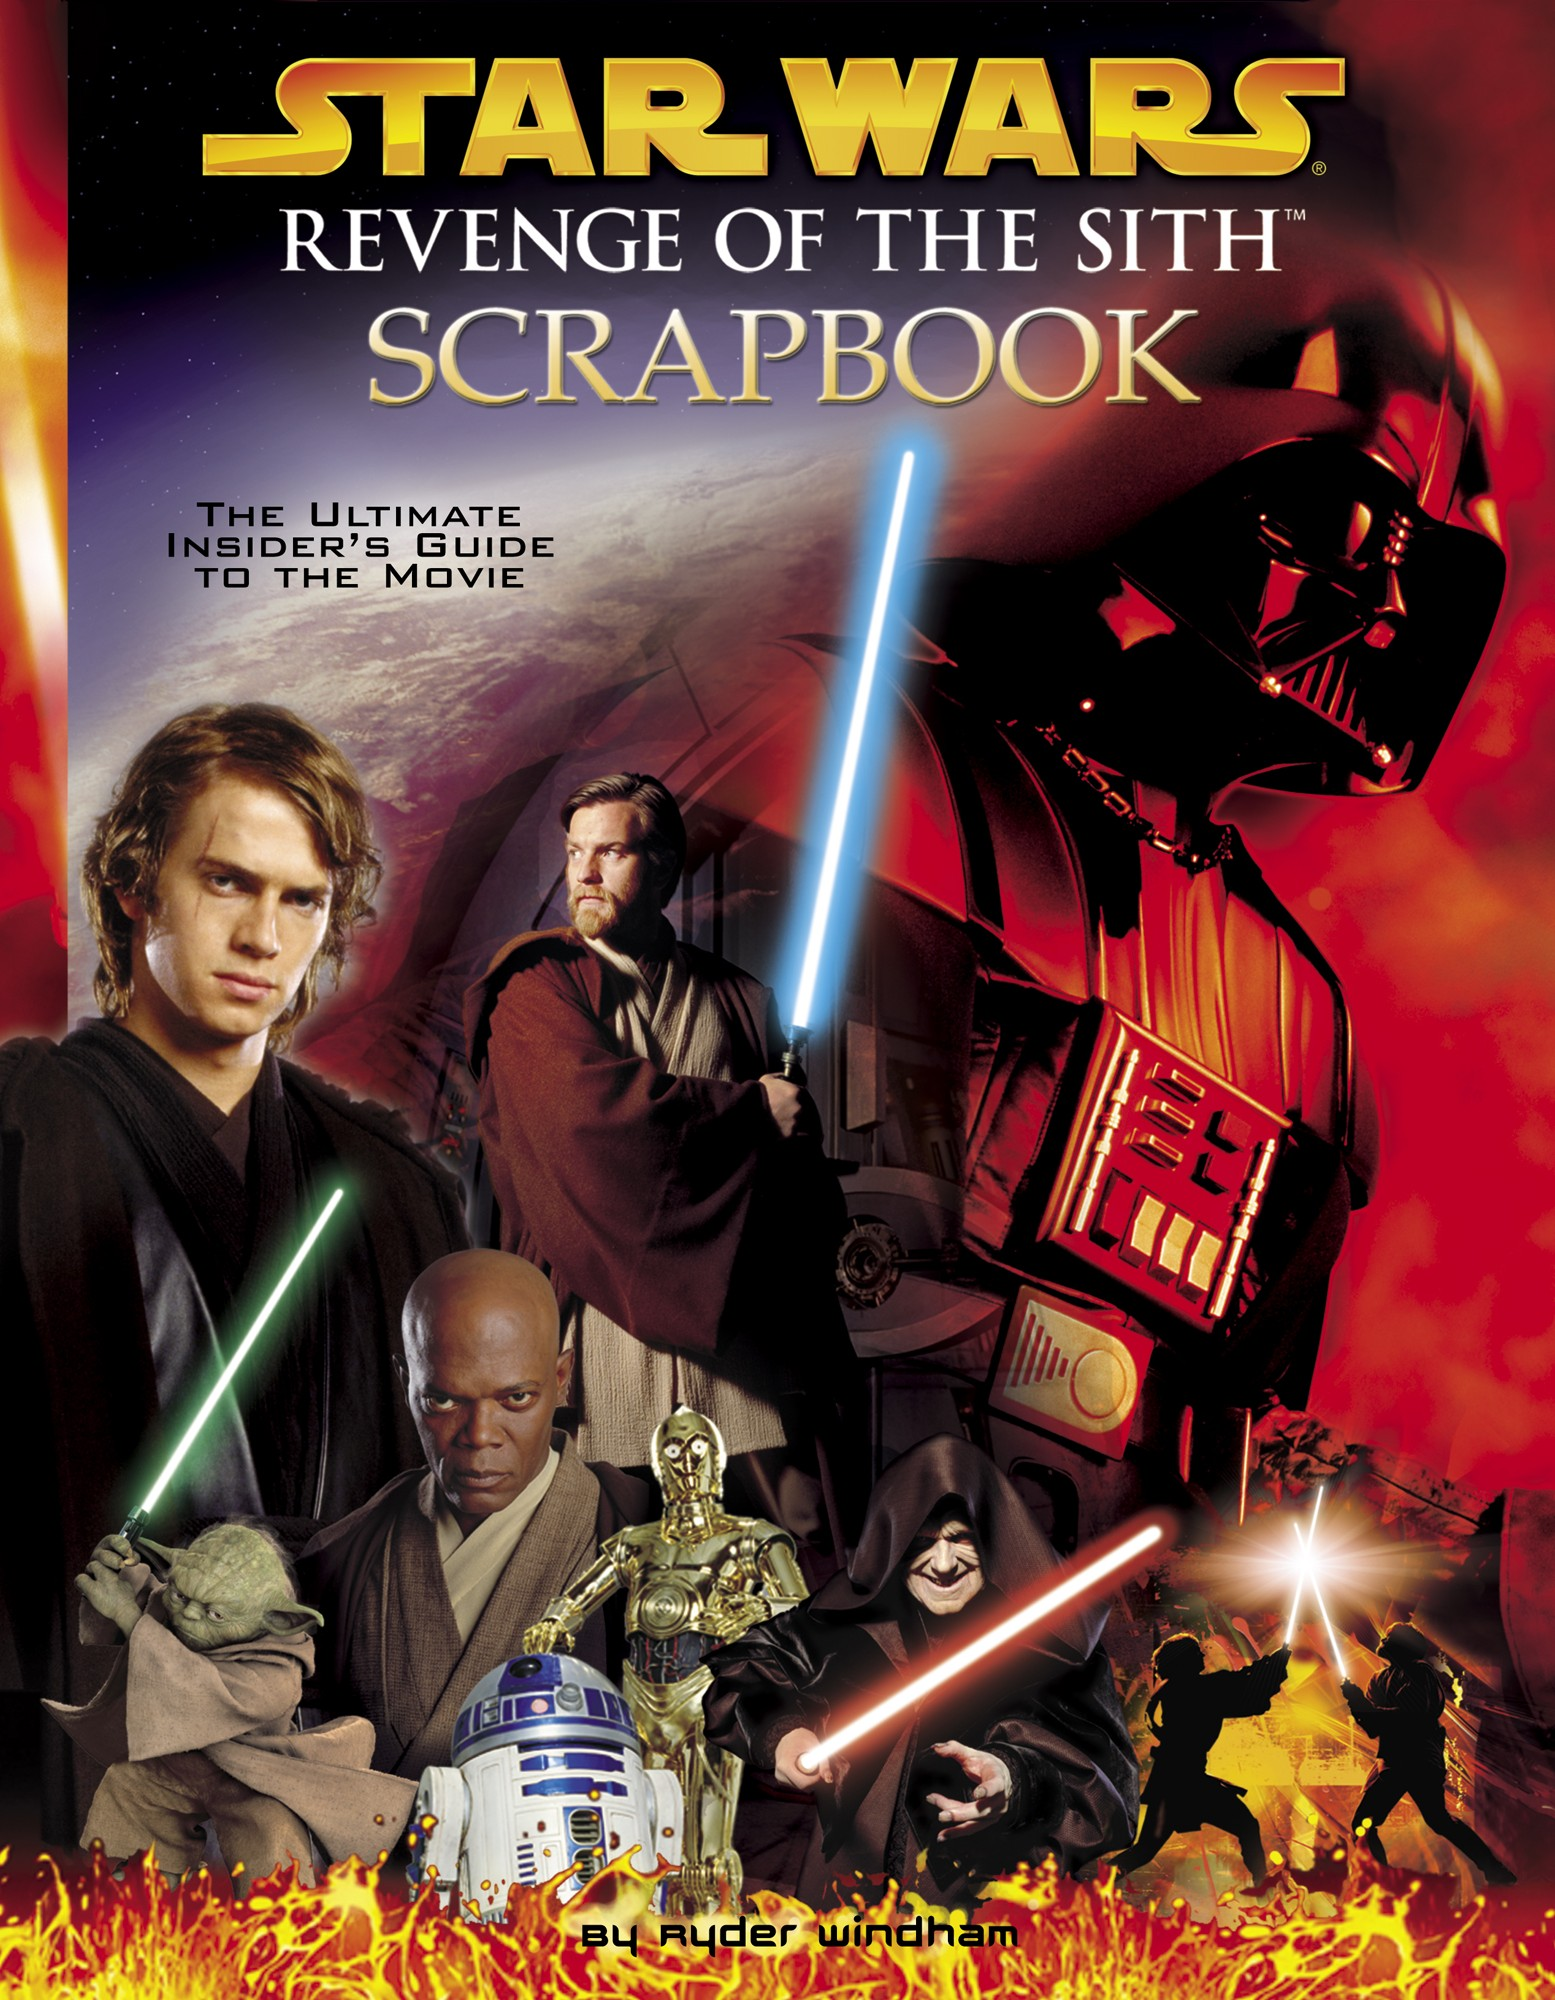 Star Wars Episode Iii Revenge Of The Sith Full Game Free Pc Download Play Star Wars Episode Iii Revenge Of The Sith Download Torrent Games